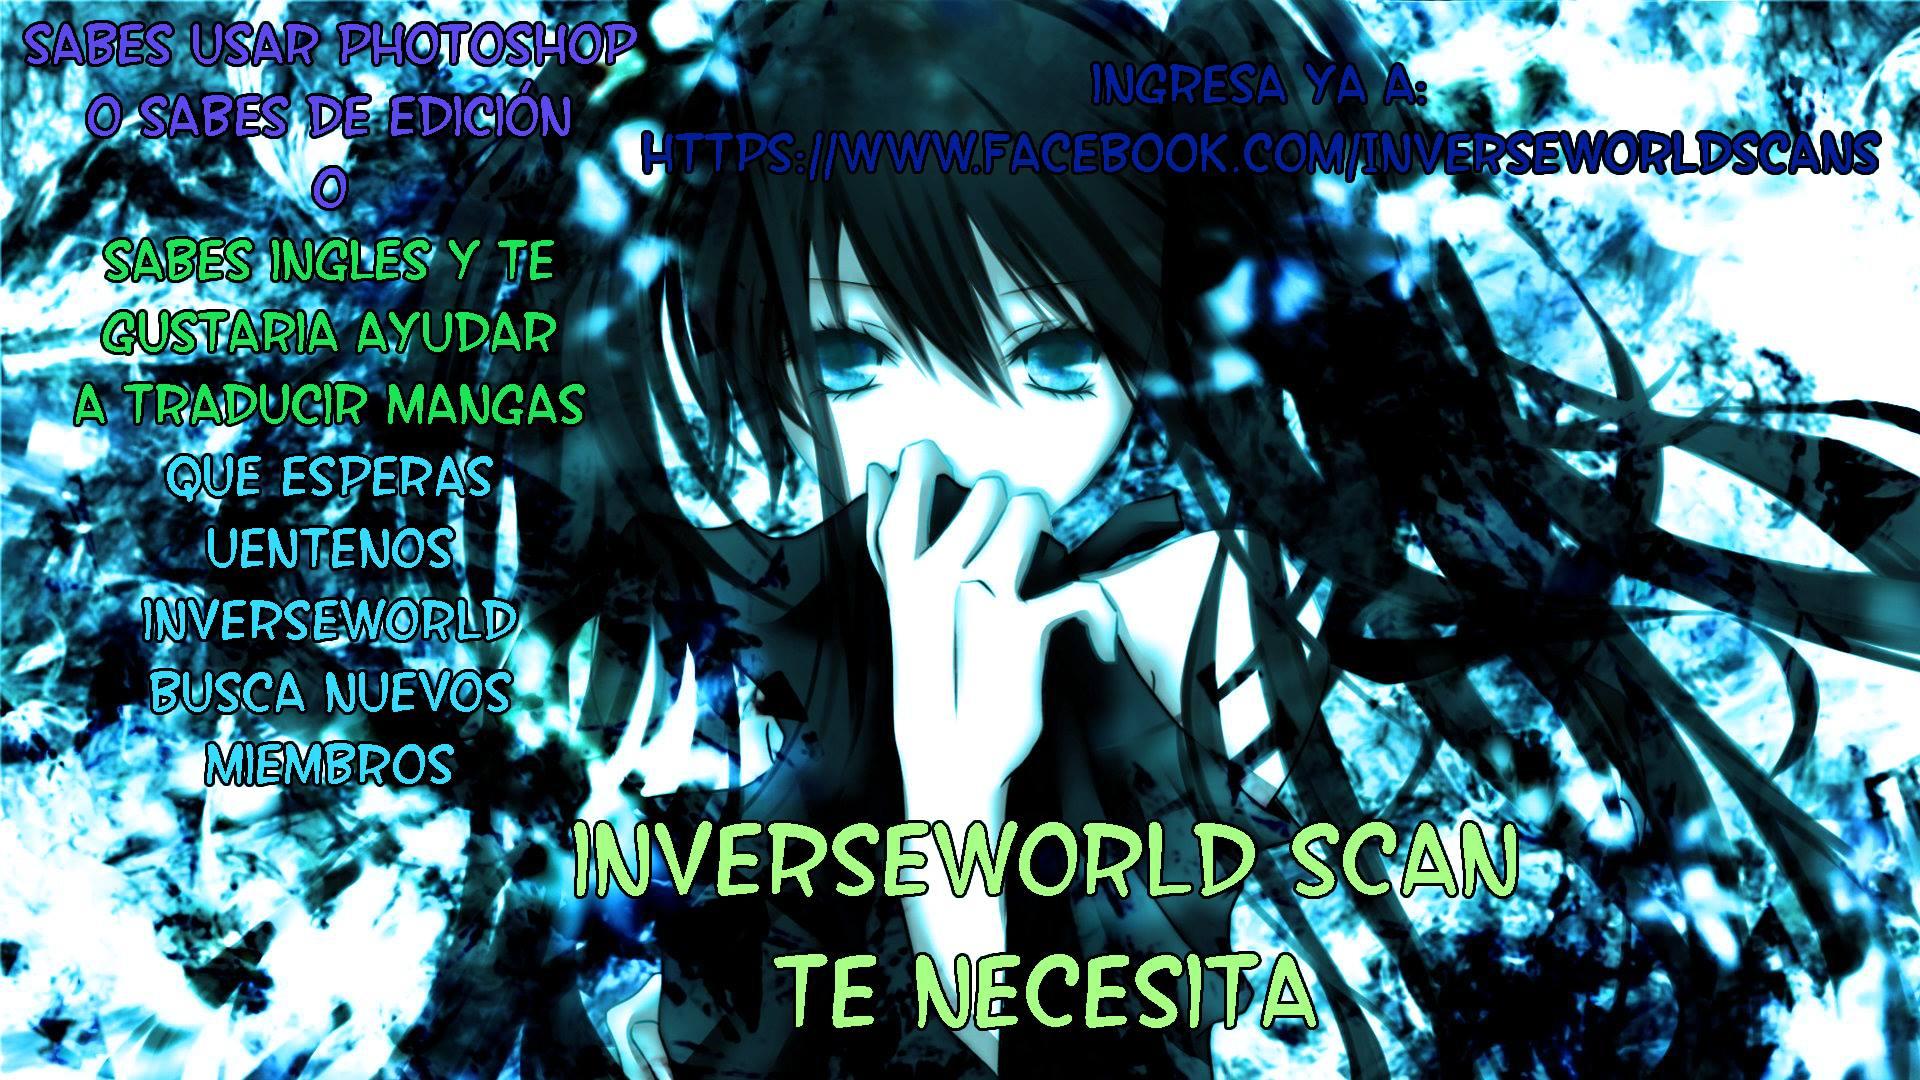 http://c5.ninemanga.com/es_manga/18/16210/415326/a0d3973ad100ad83a64c304bb58677dd.jpg Page 1